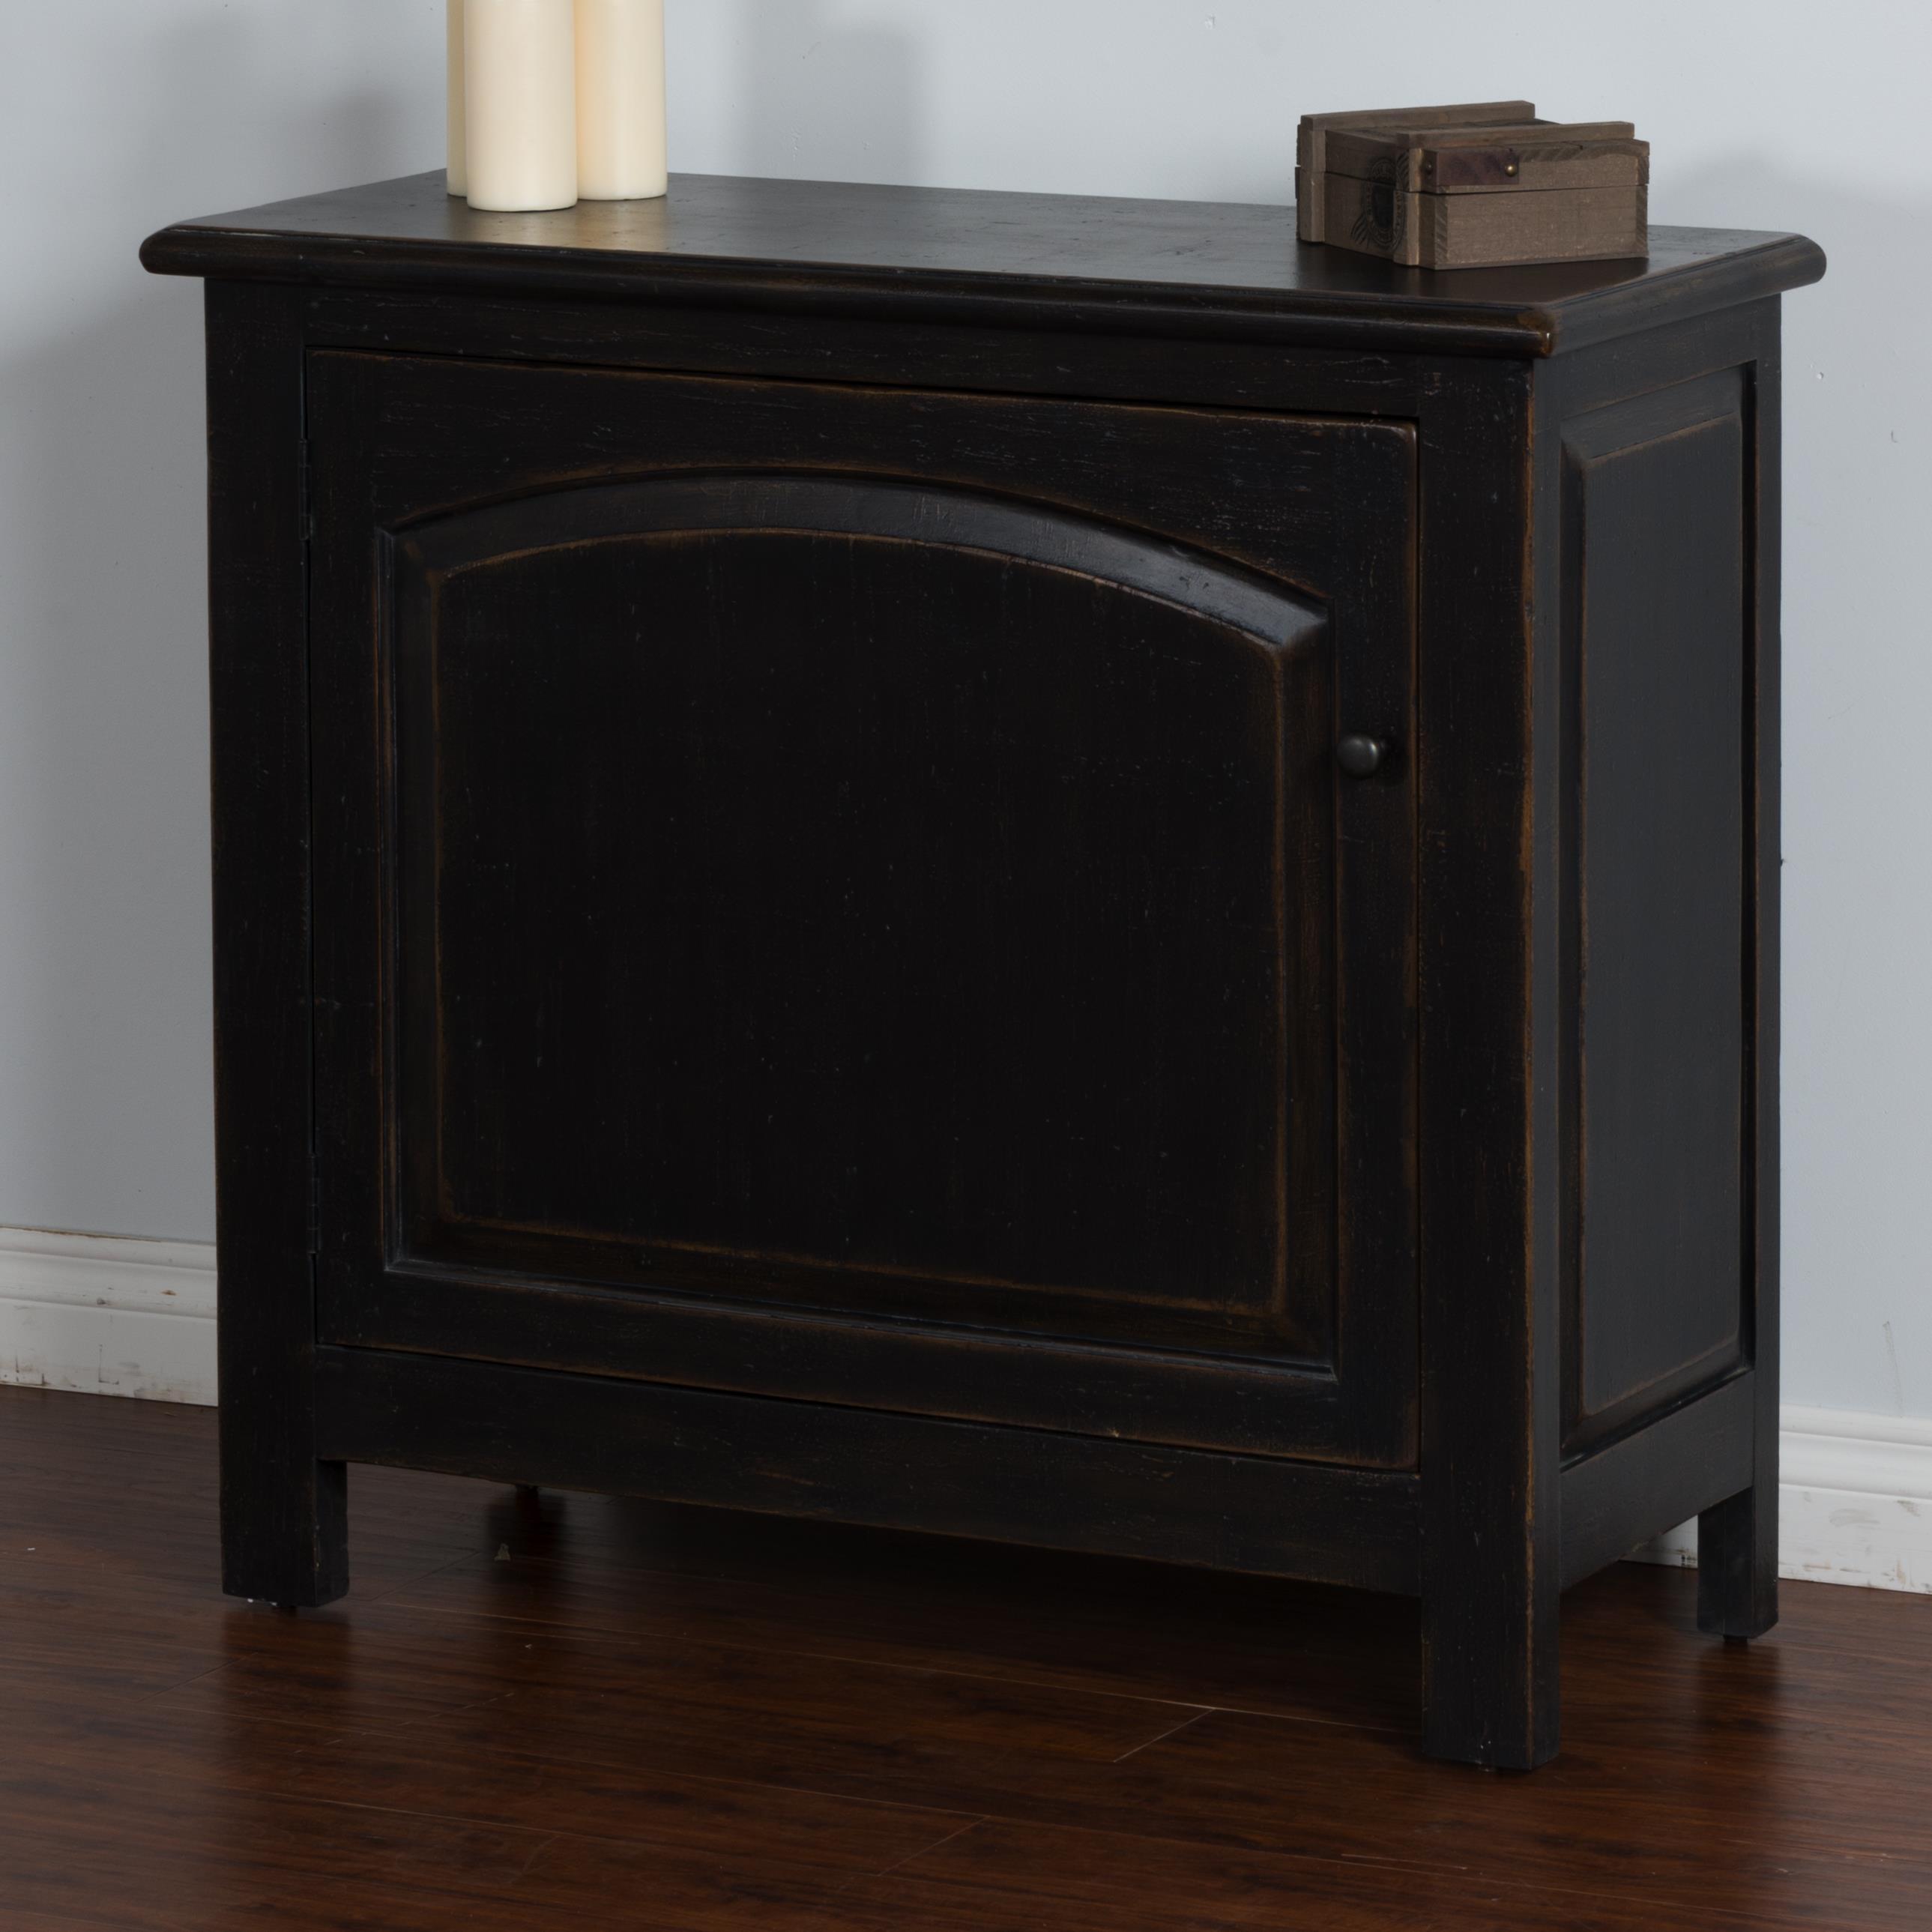 Sunny Designs Black Accent Chest w/ Arch Door - Item Number: 2271B